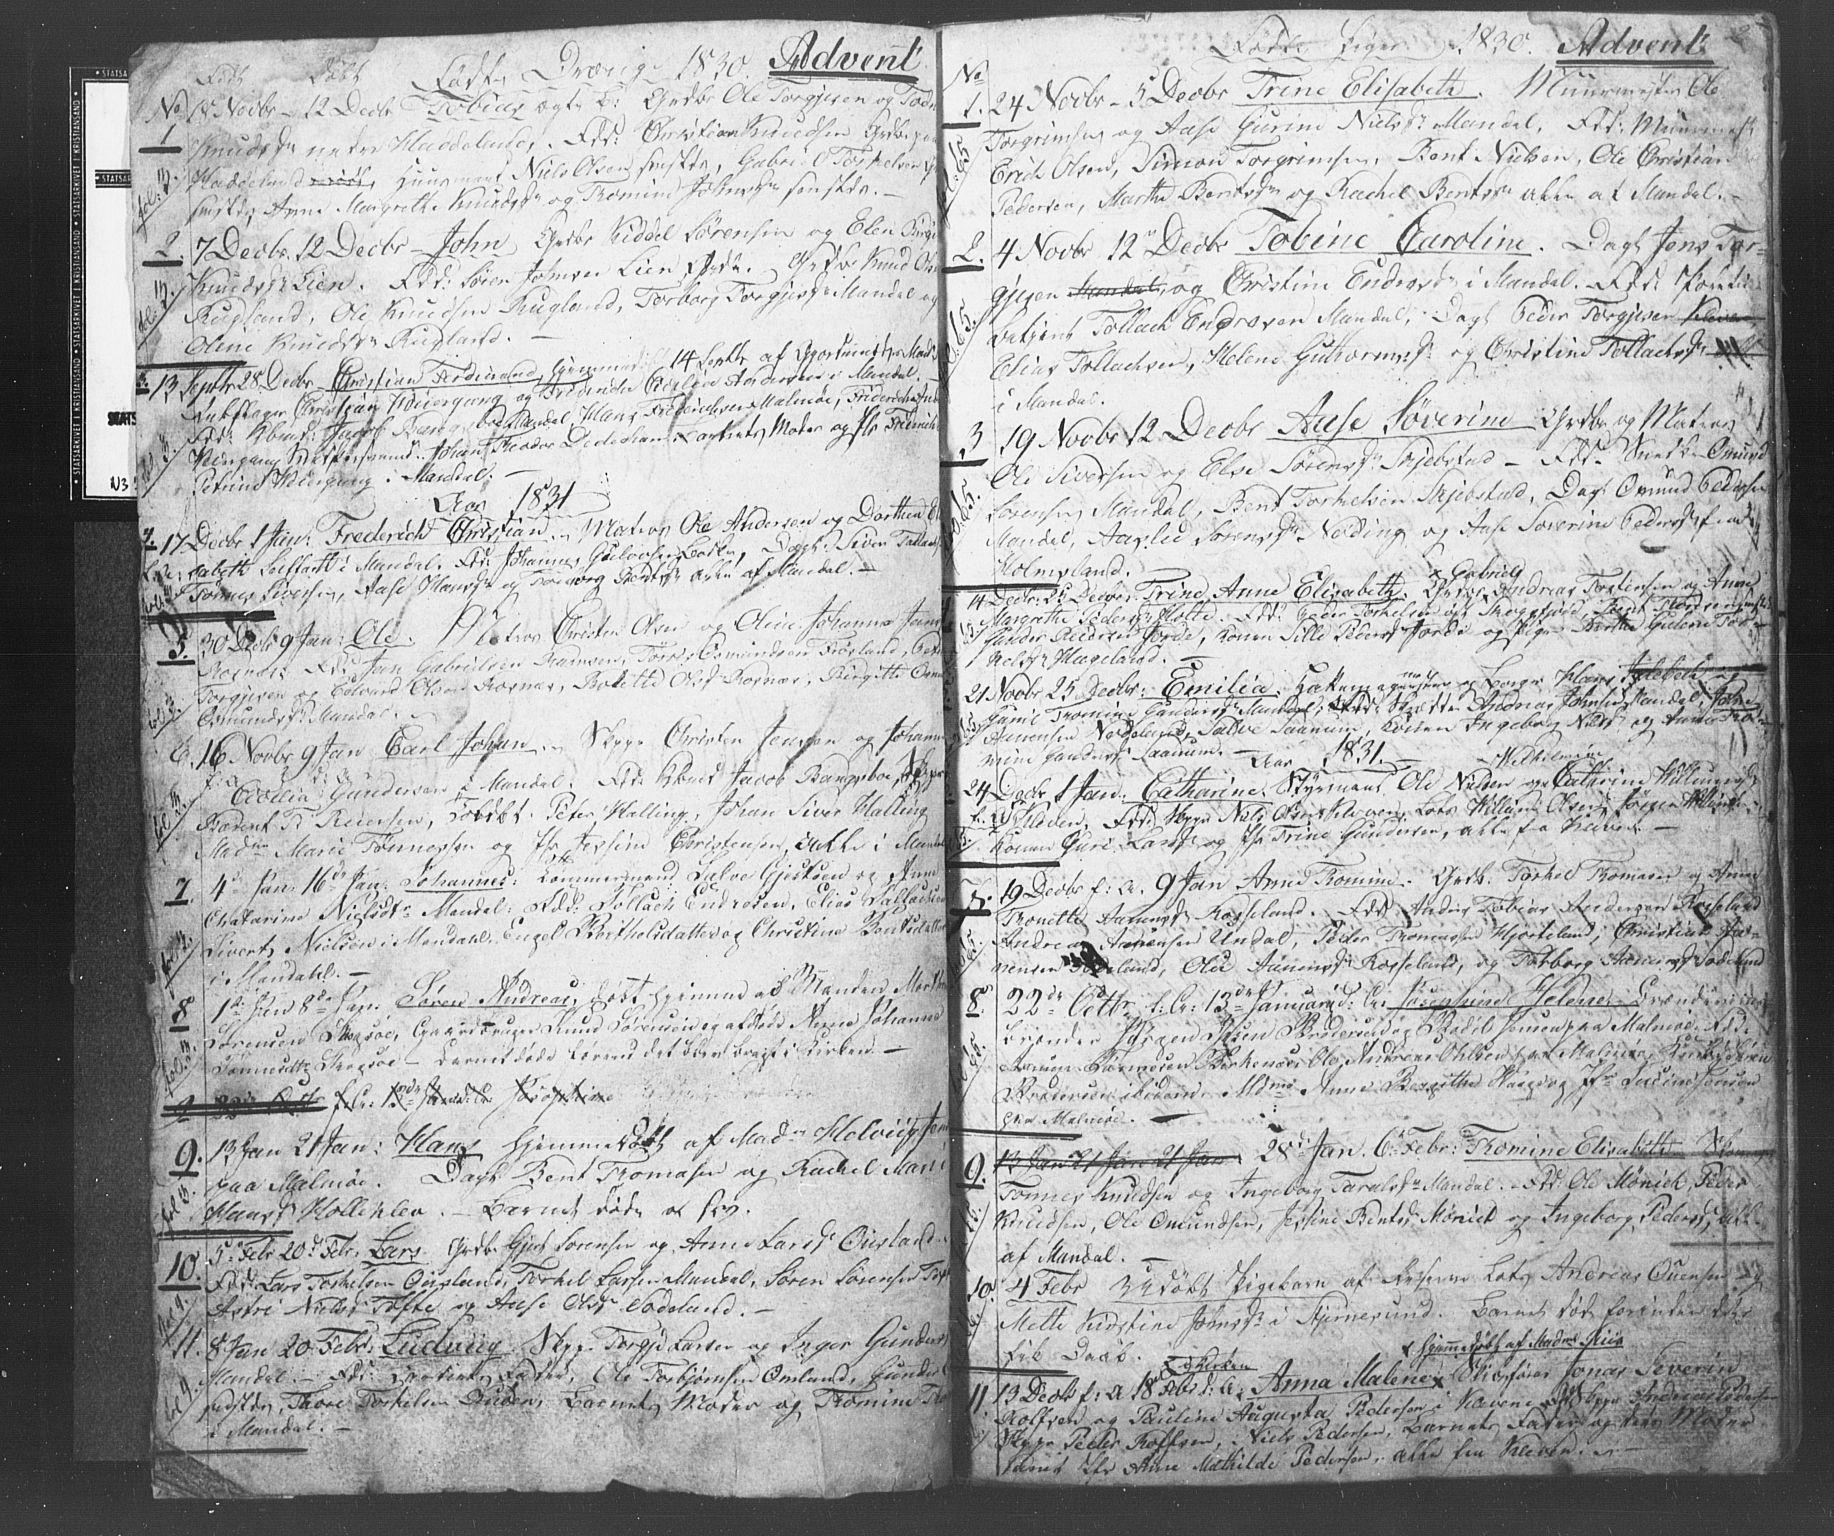 SAK, Mandal sokneprestkontor, F/Fb/Fba/L0003: Klokkerbok nr. B 1B, 1831-1834, s. 2